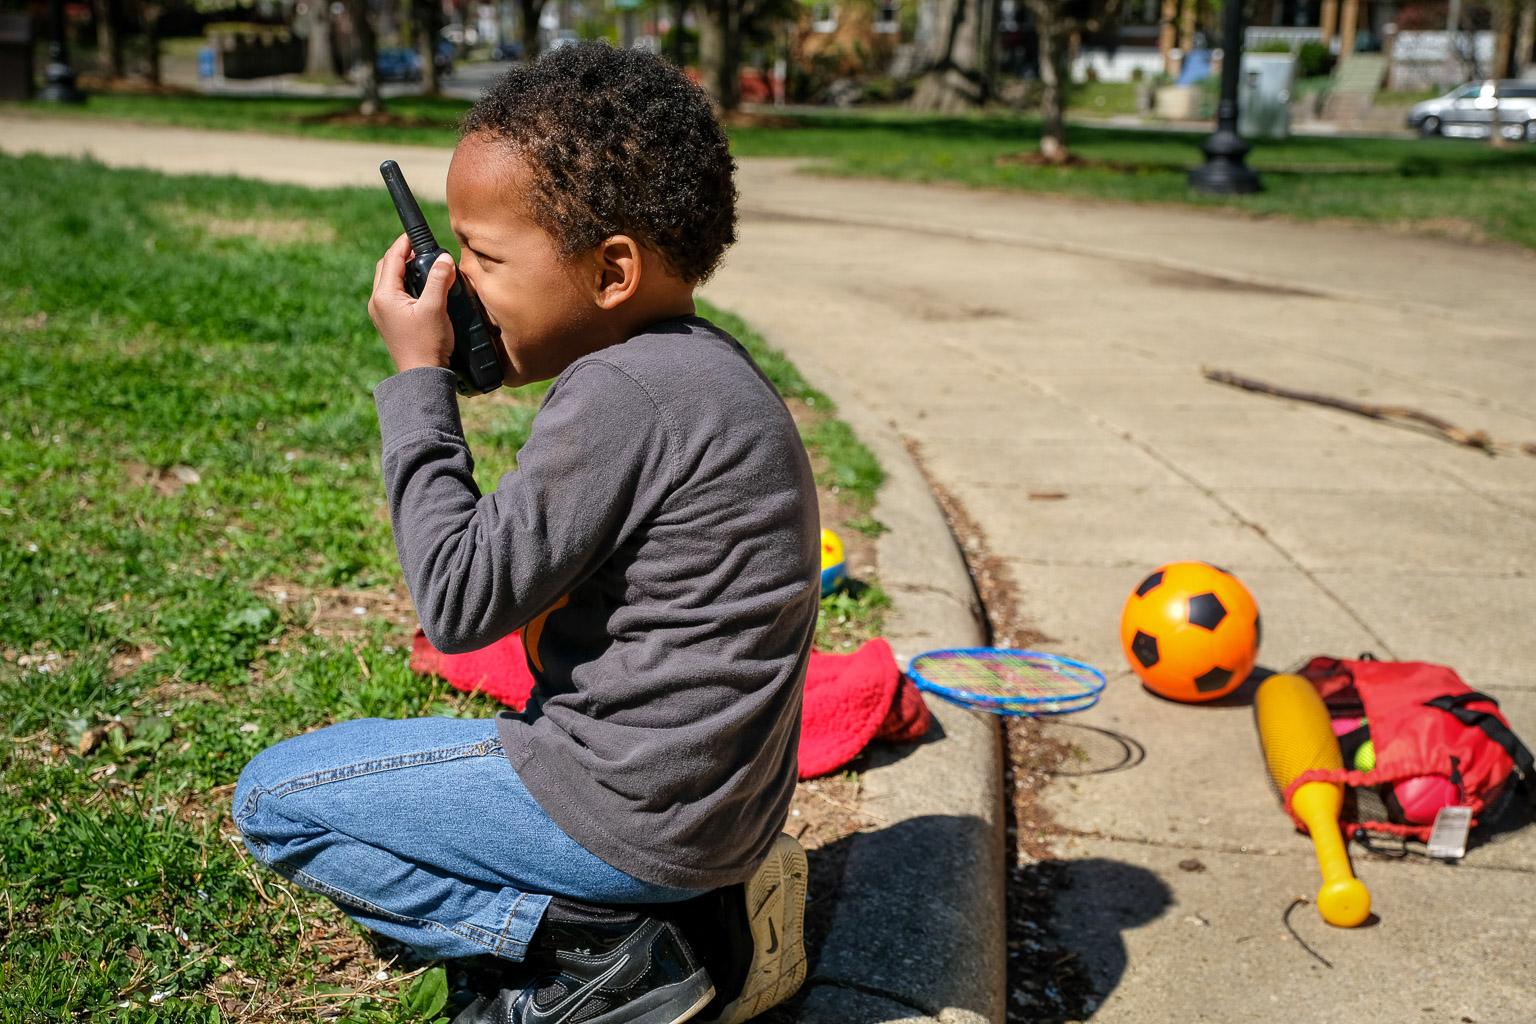 Lenzy_Ruffin_Photography_Family_Portrait_Photographer_Washington_DC__4-8-17-270.jpg